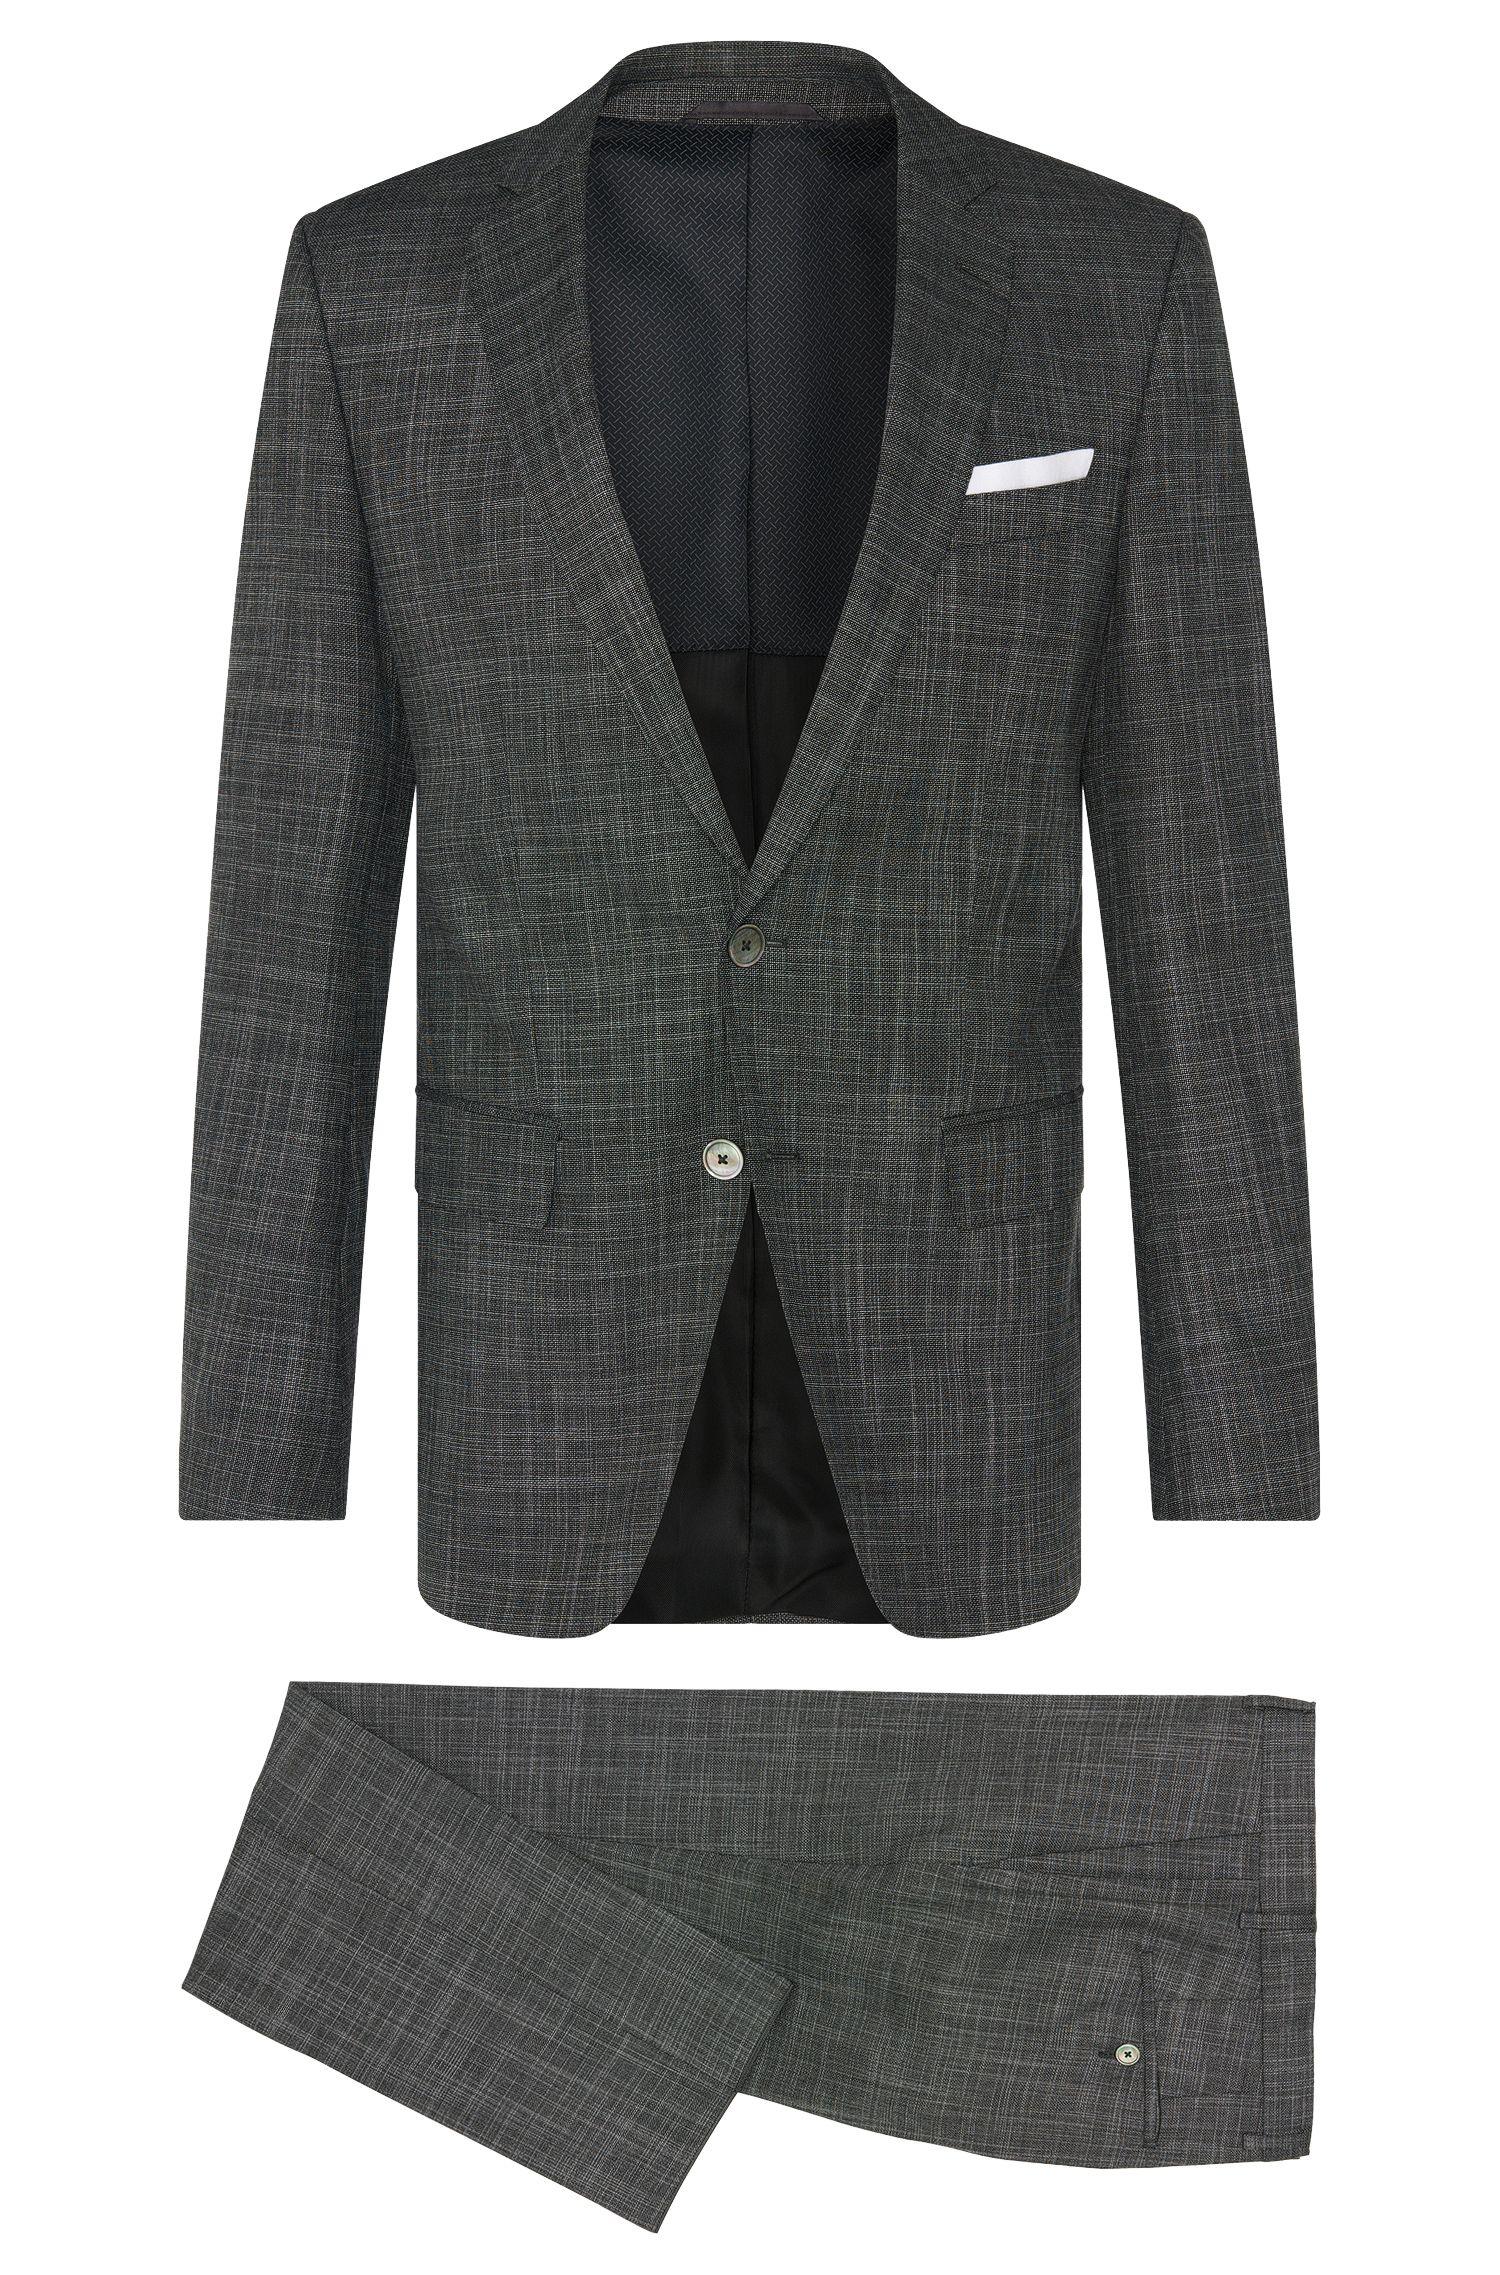 Stretch Wool Blend 3-Piece Suit, Slim Fit | Hutson/Gander WE